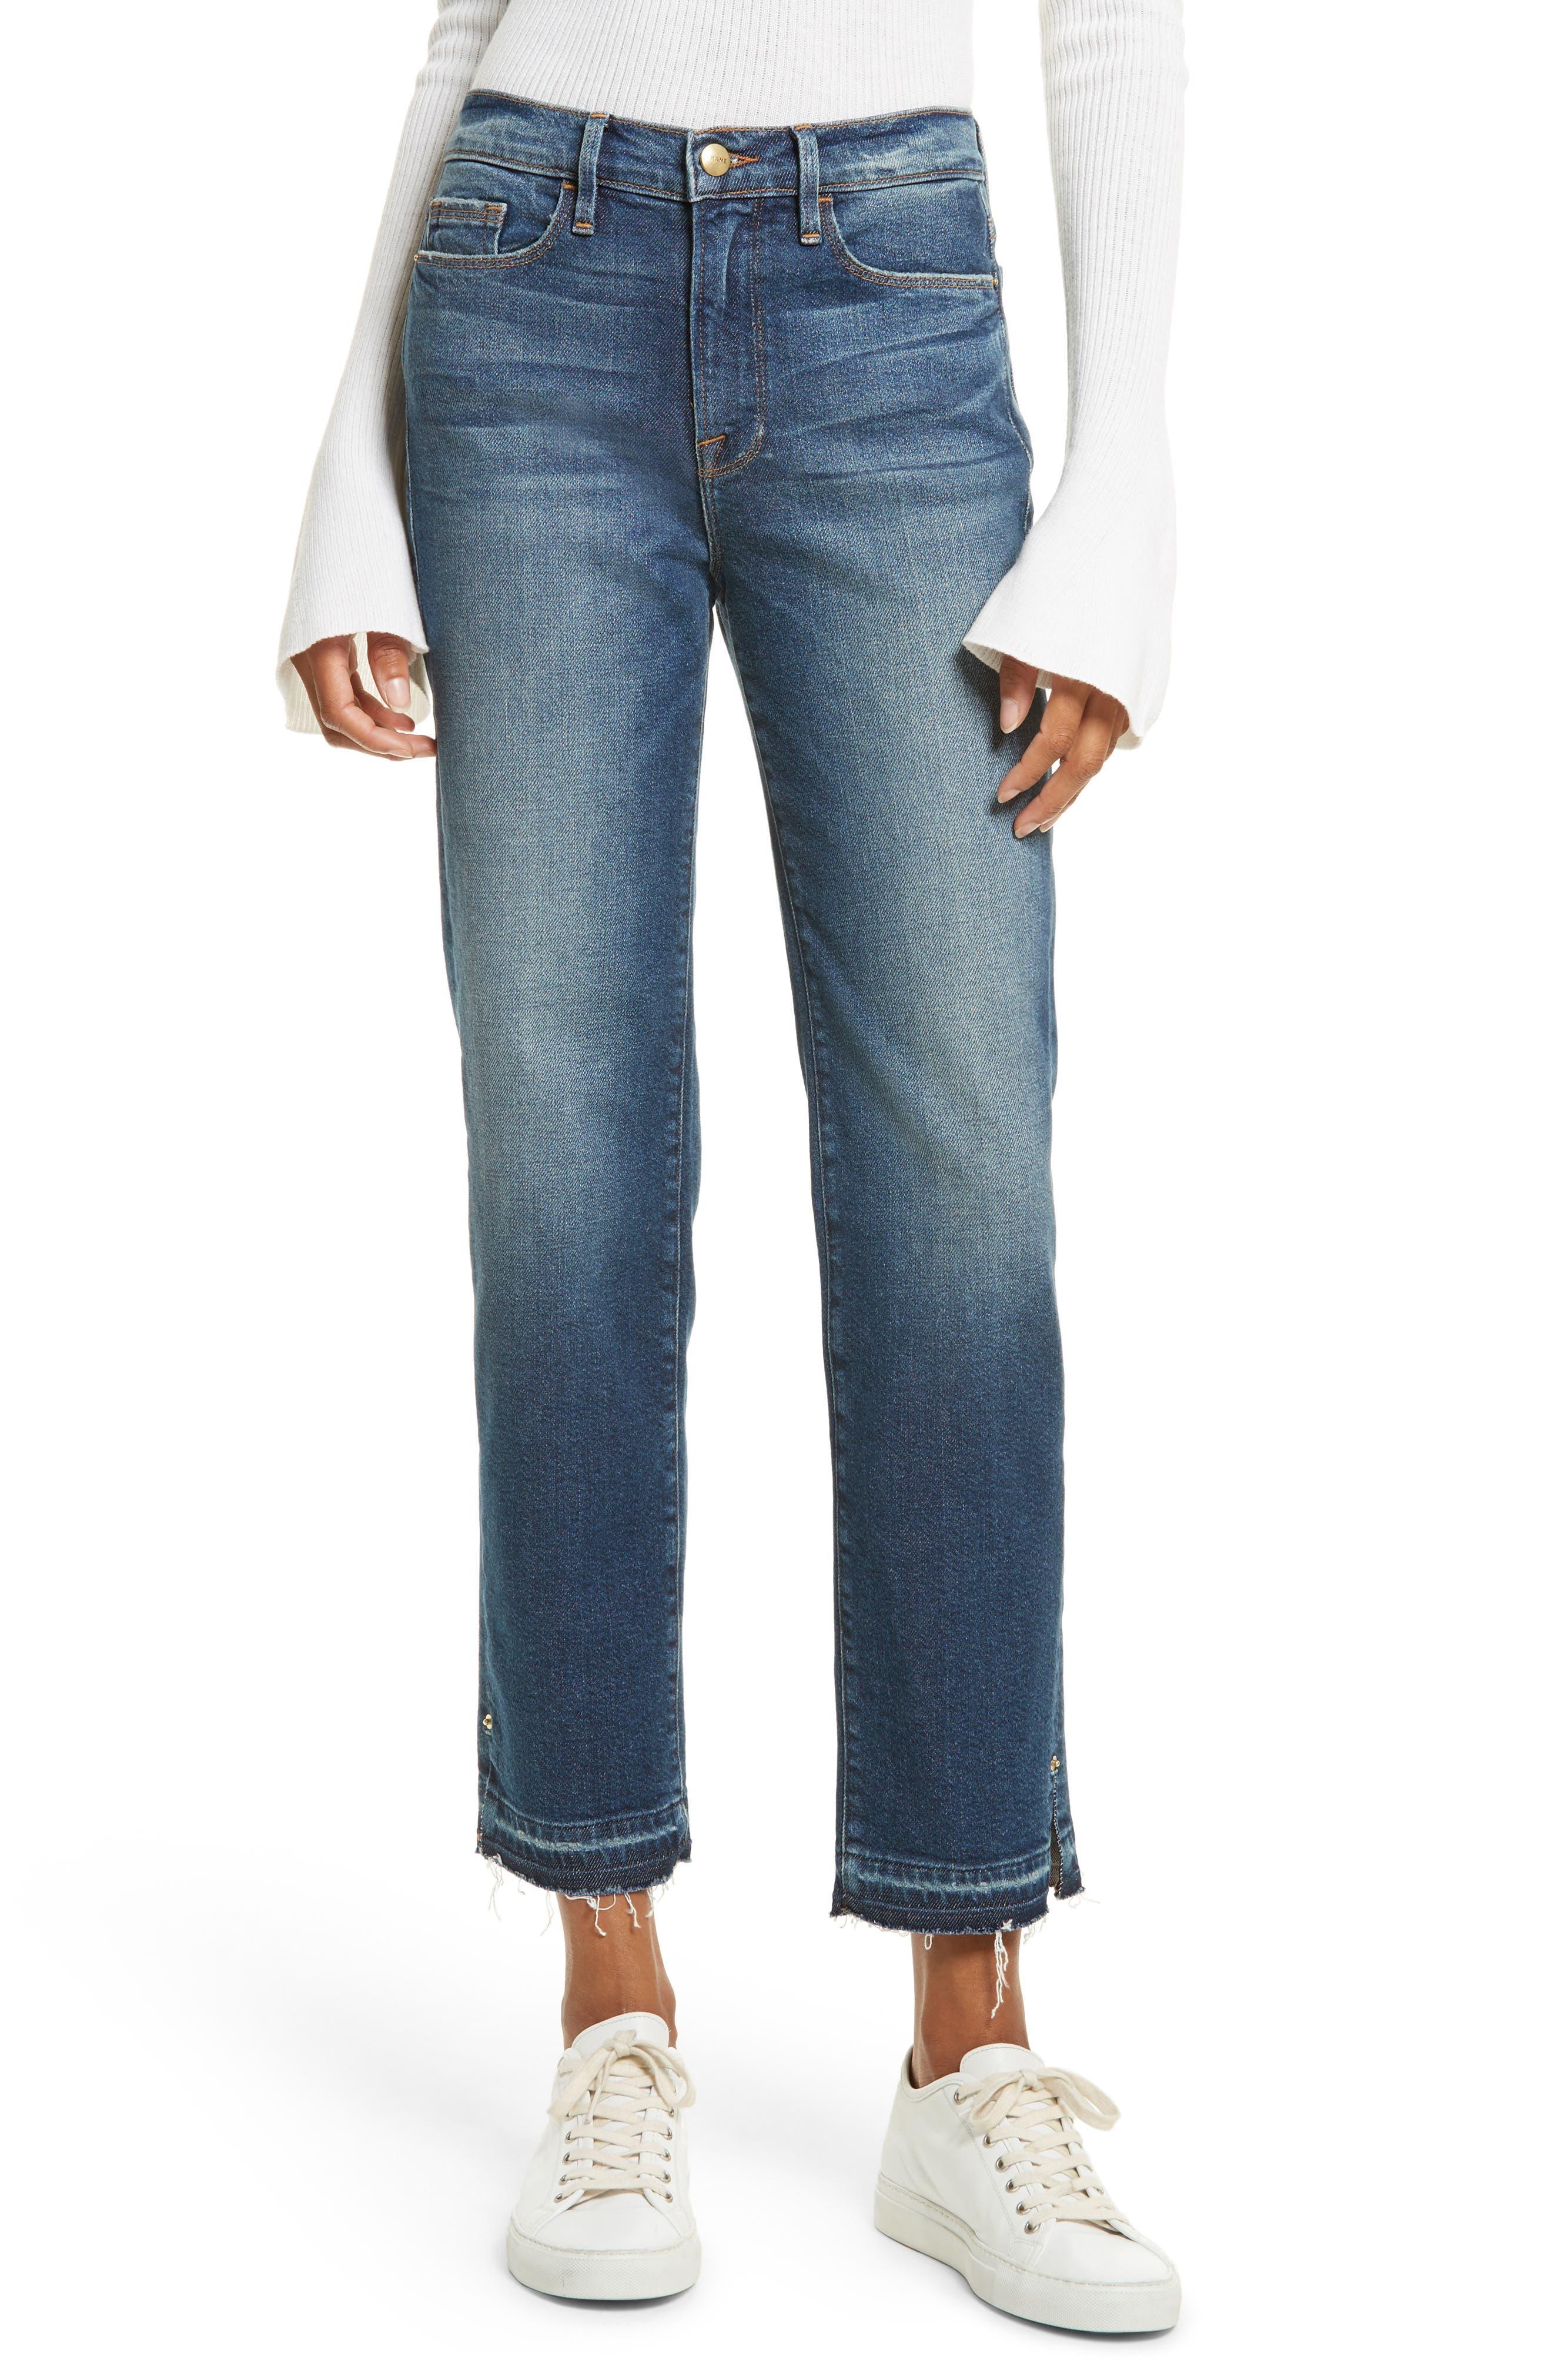 Alternate Image 1 Selected - FRAME High Waist Released Hem Crop Jeans (Granby)